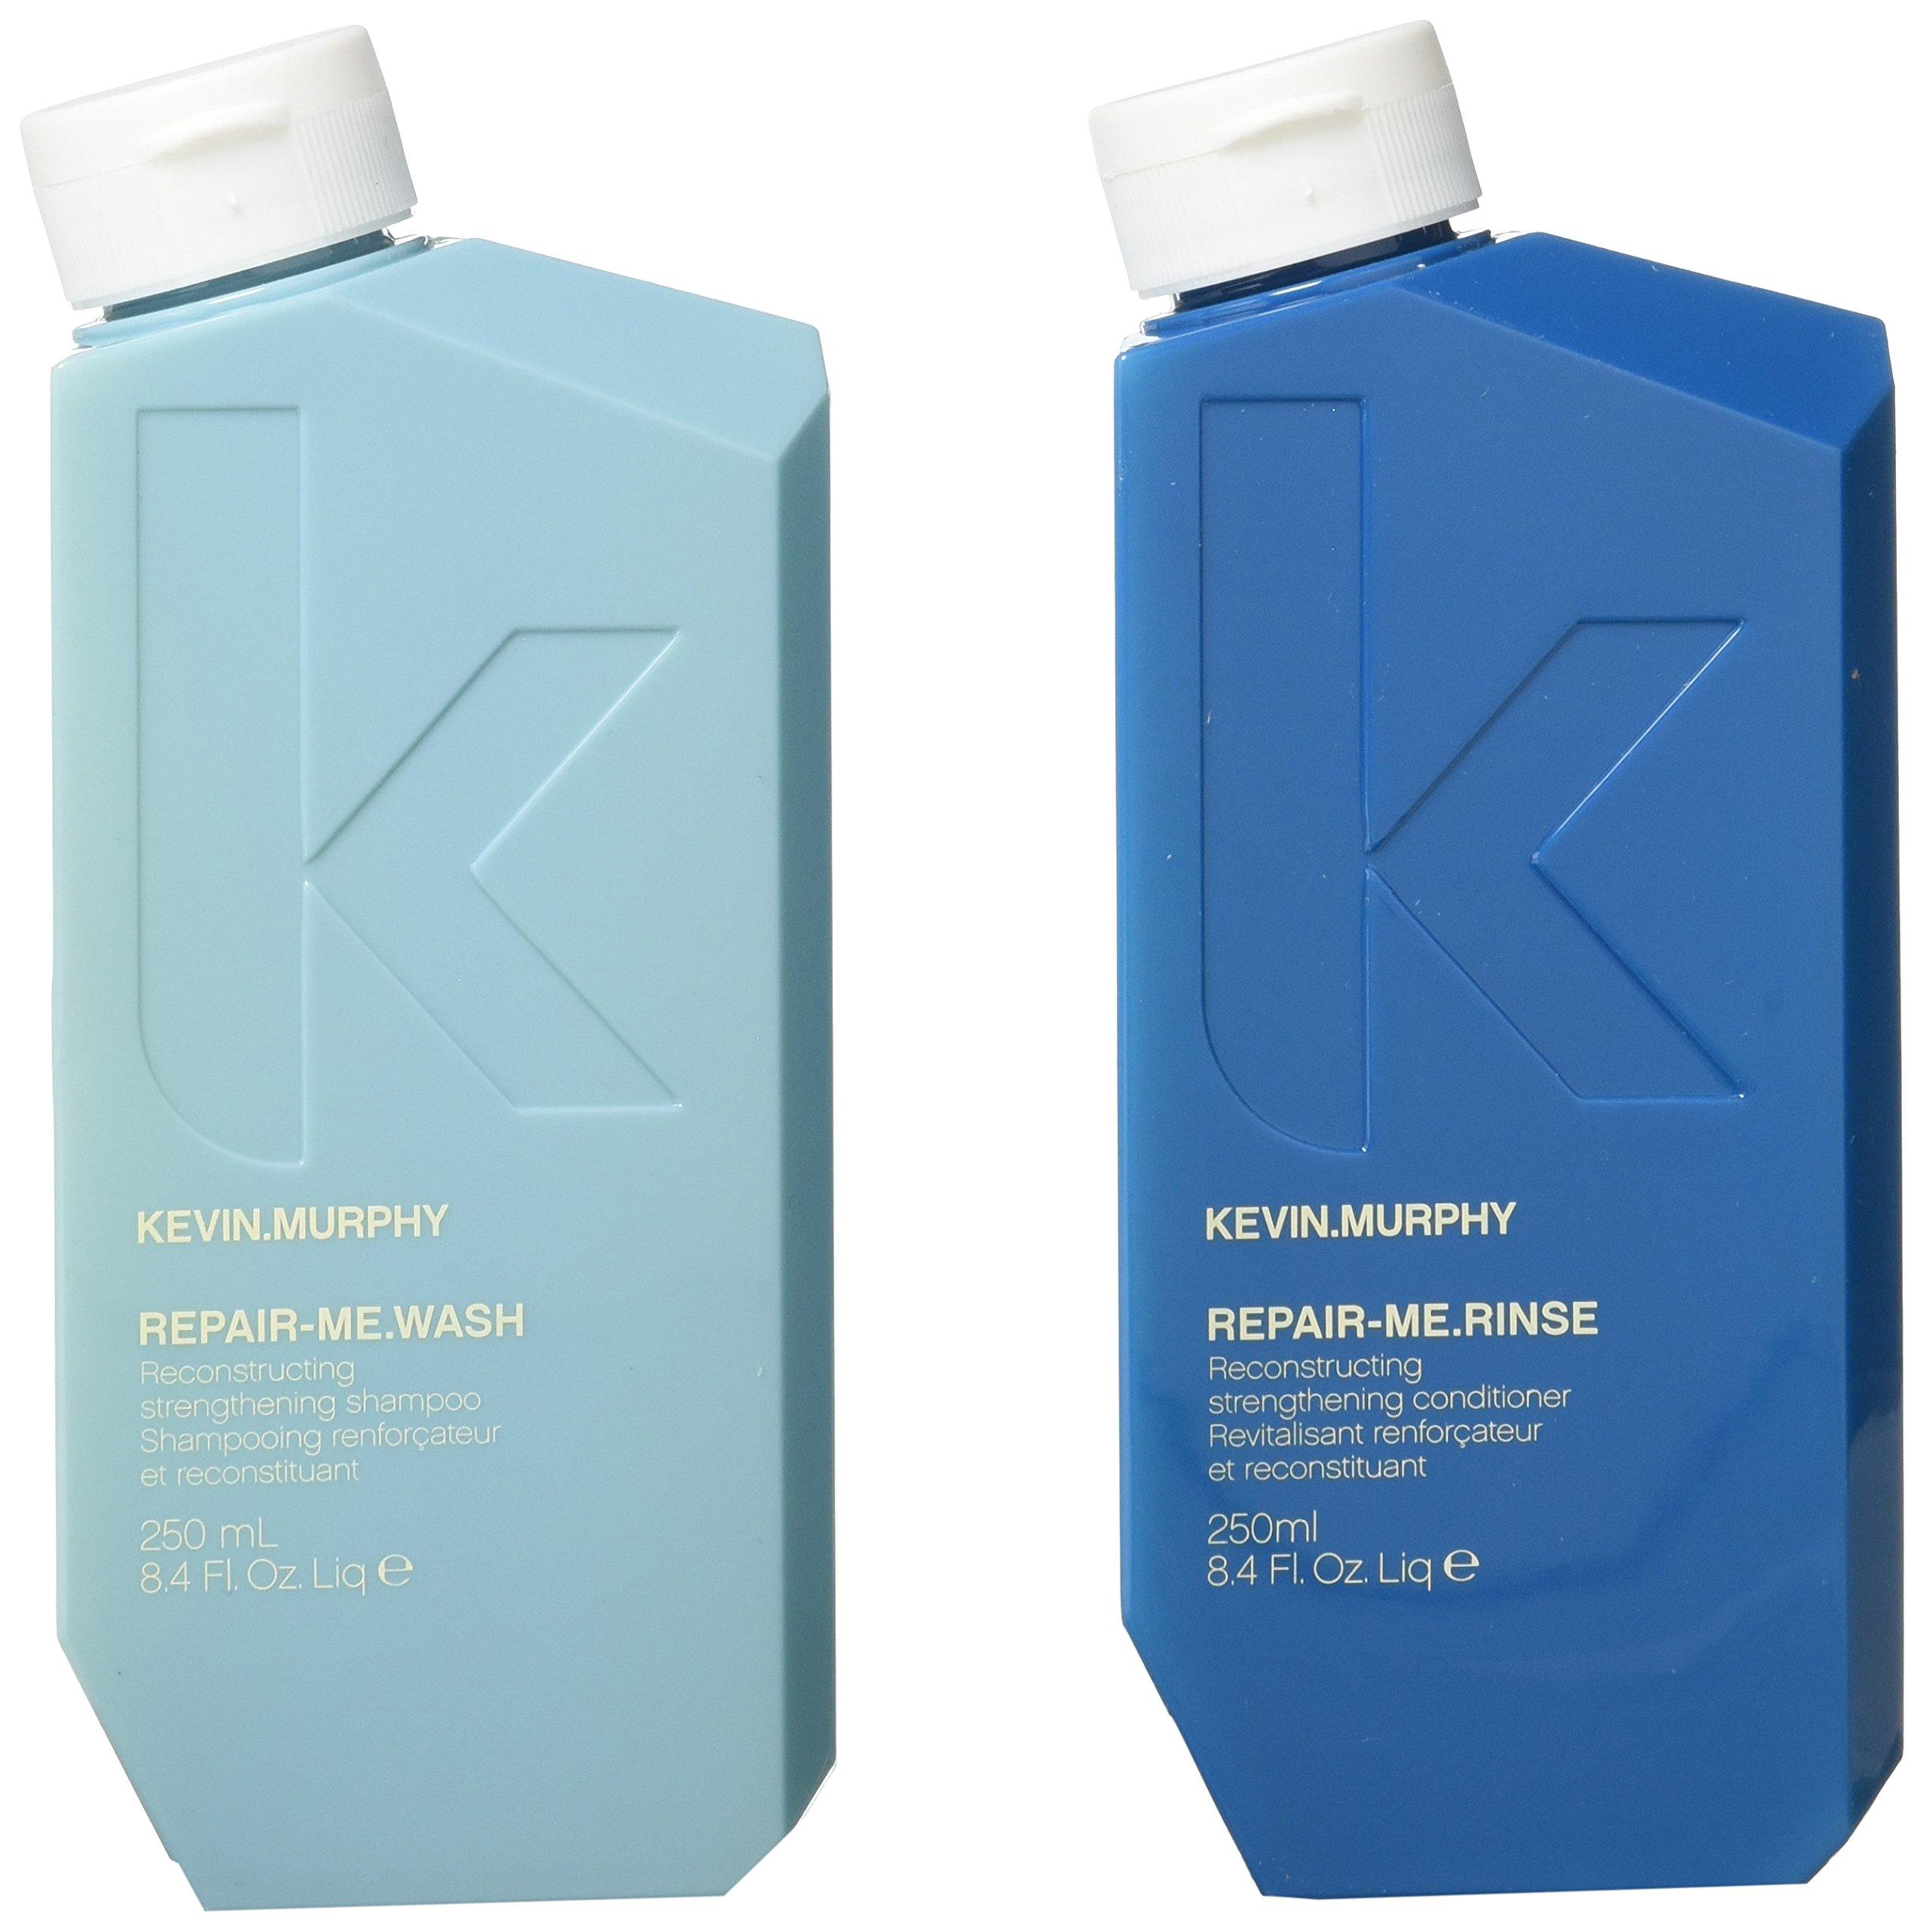 Kevin Murphy Repair Me Wash & Repair Me Rinse Duo 8.4 oz by Kevin Murphy